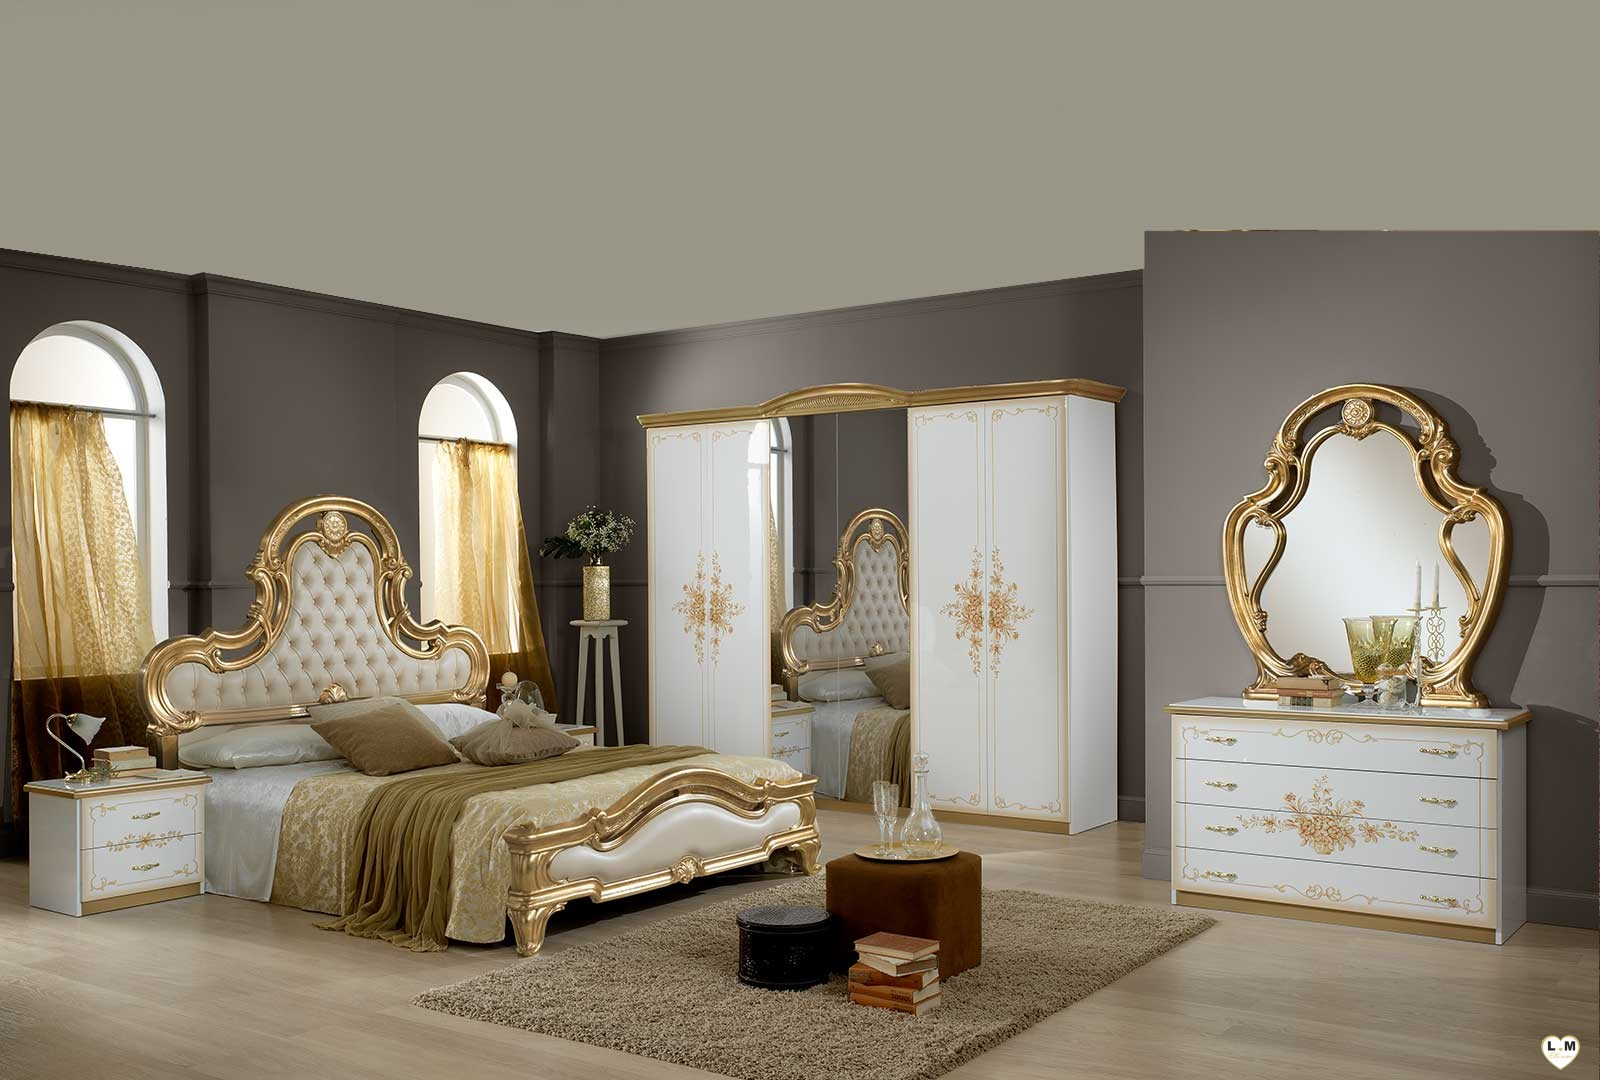 Tiara laque blanc mat et dore ensemble chambre a coucher for Ensemble chambre a coucher